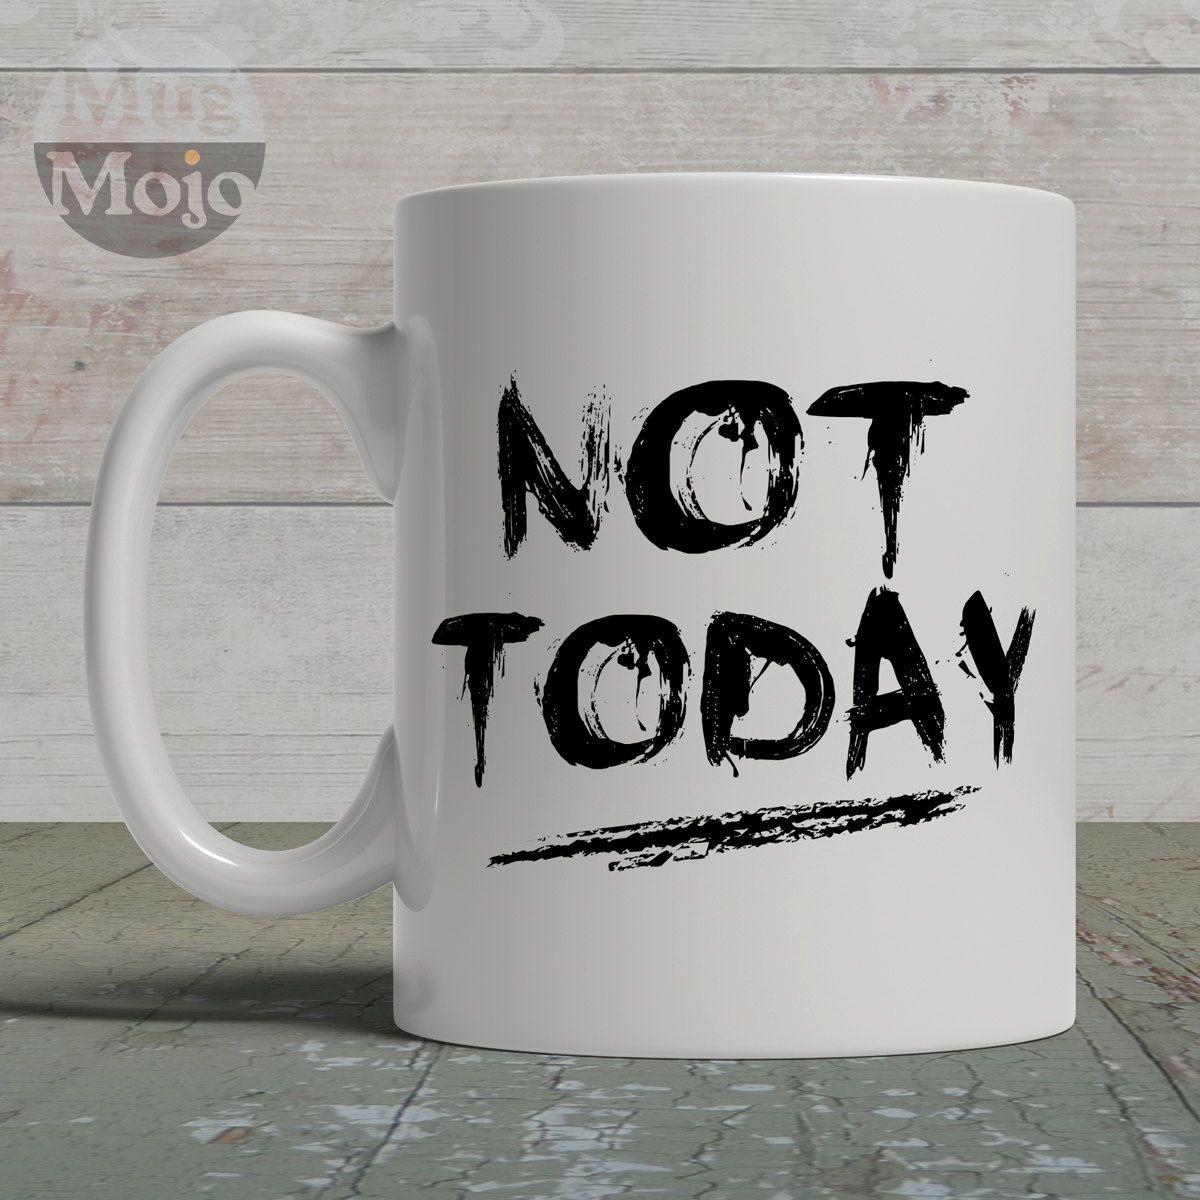 Funny Coffee Mug NOT Today Grumpy Ceramic Mug Funny